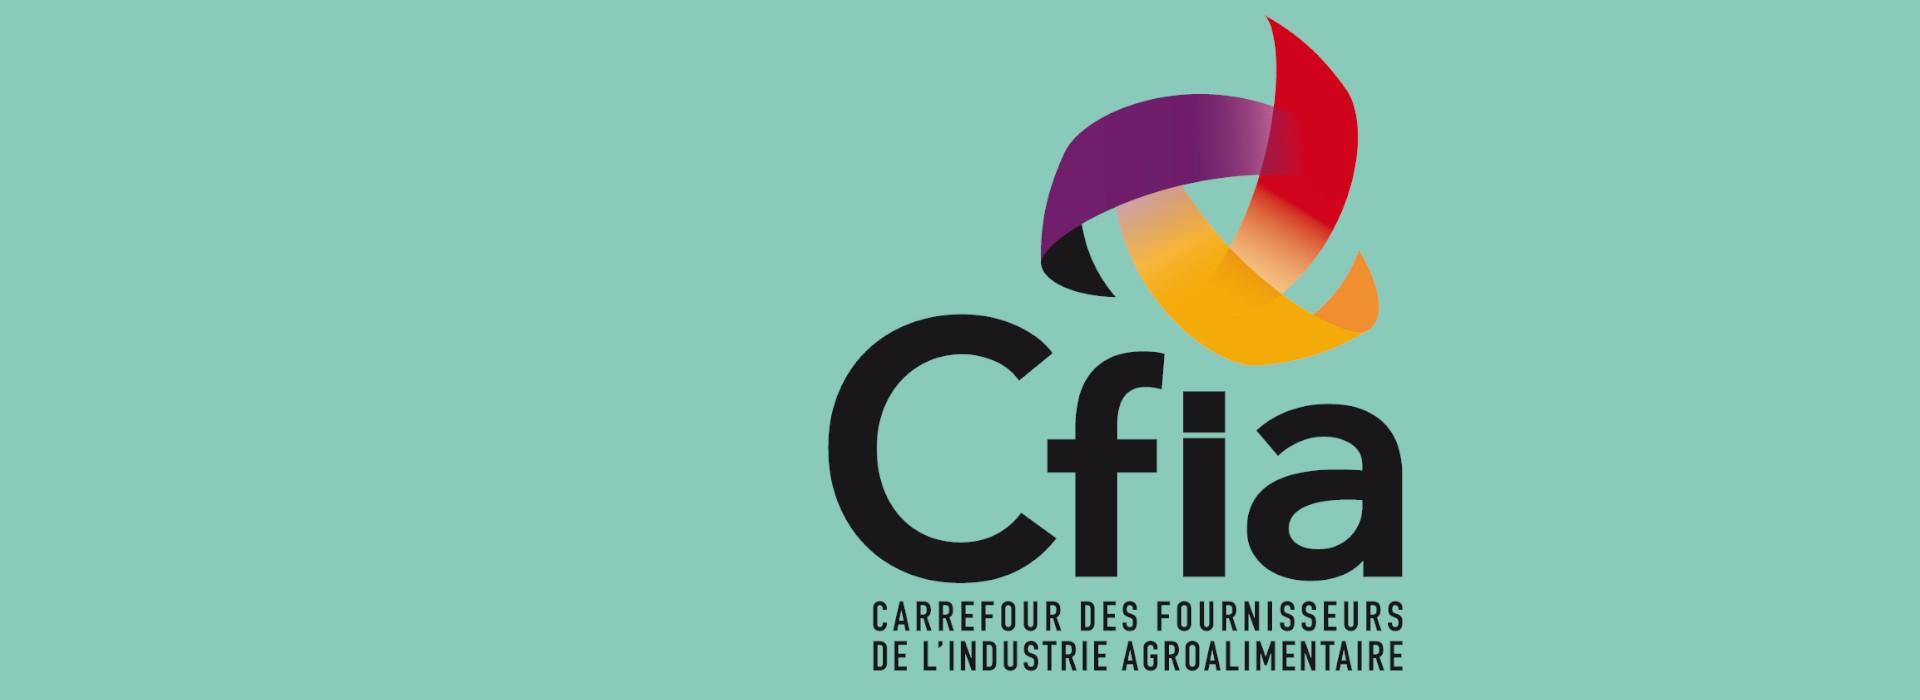 Badge gratuit salon CFIA